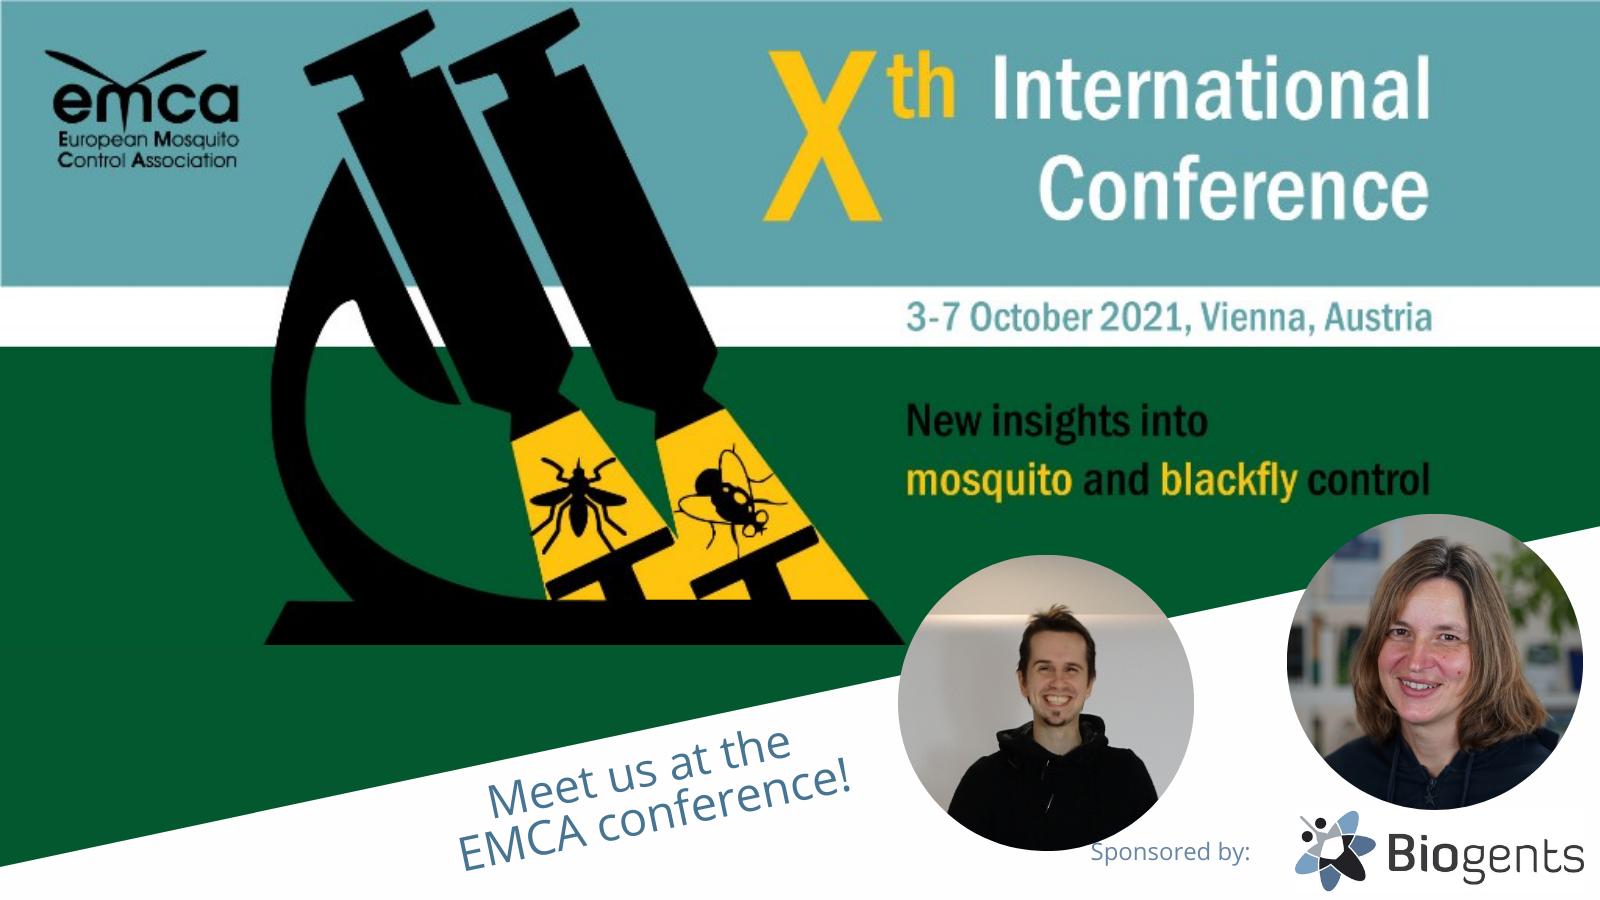 Biogents at EMCA 2021 in Vienna